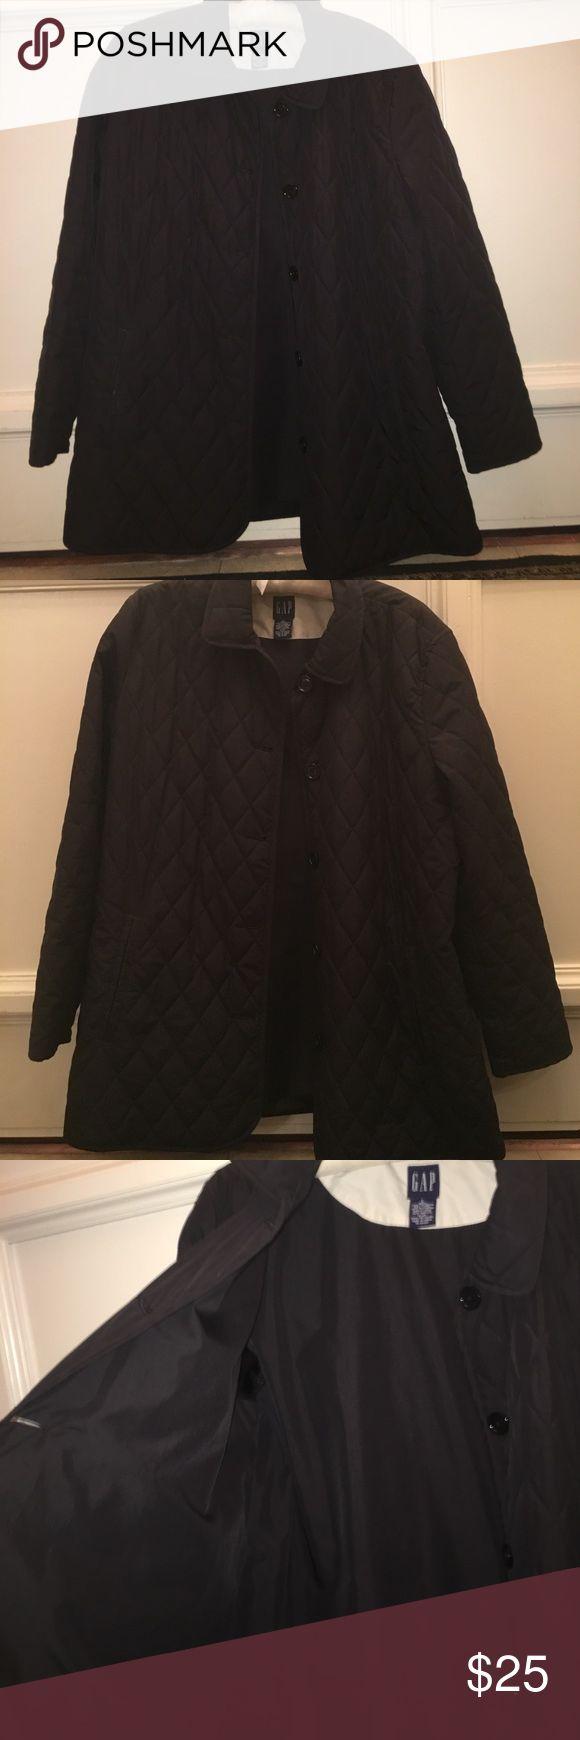 Barley worn GAP black water resistant cost Great condition. Black water resistant coat Jackets & Coats Utility Jackets